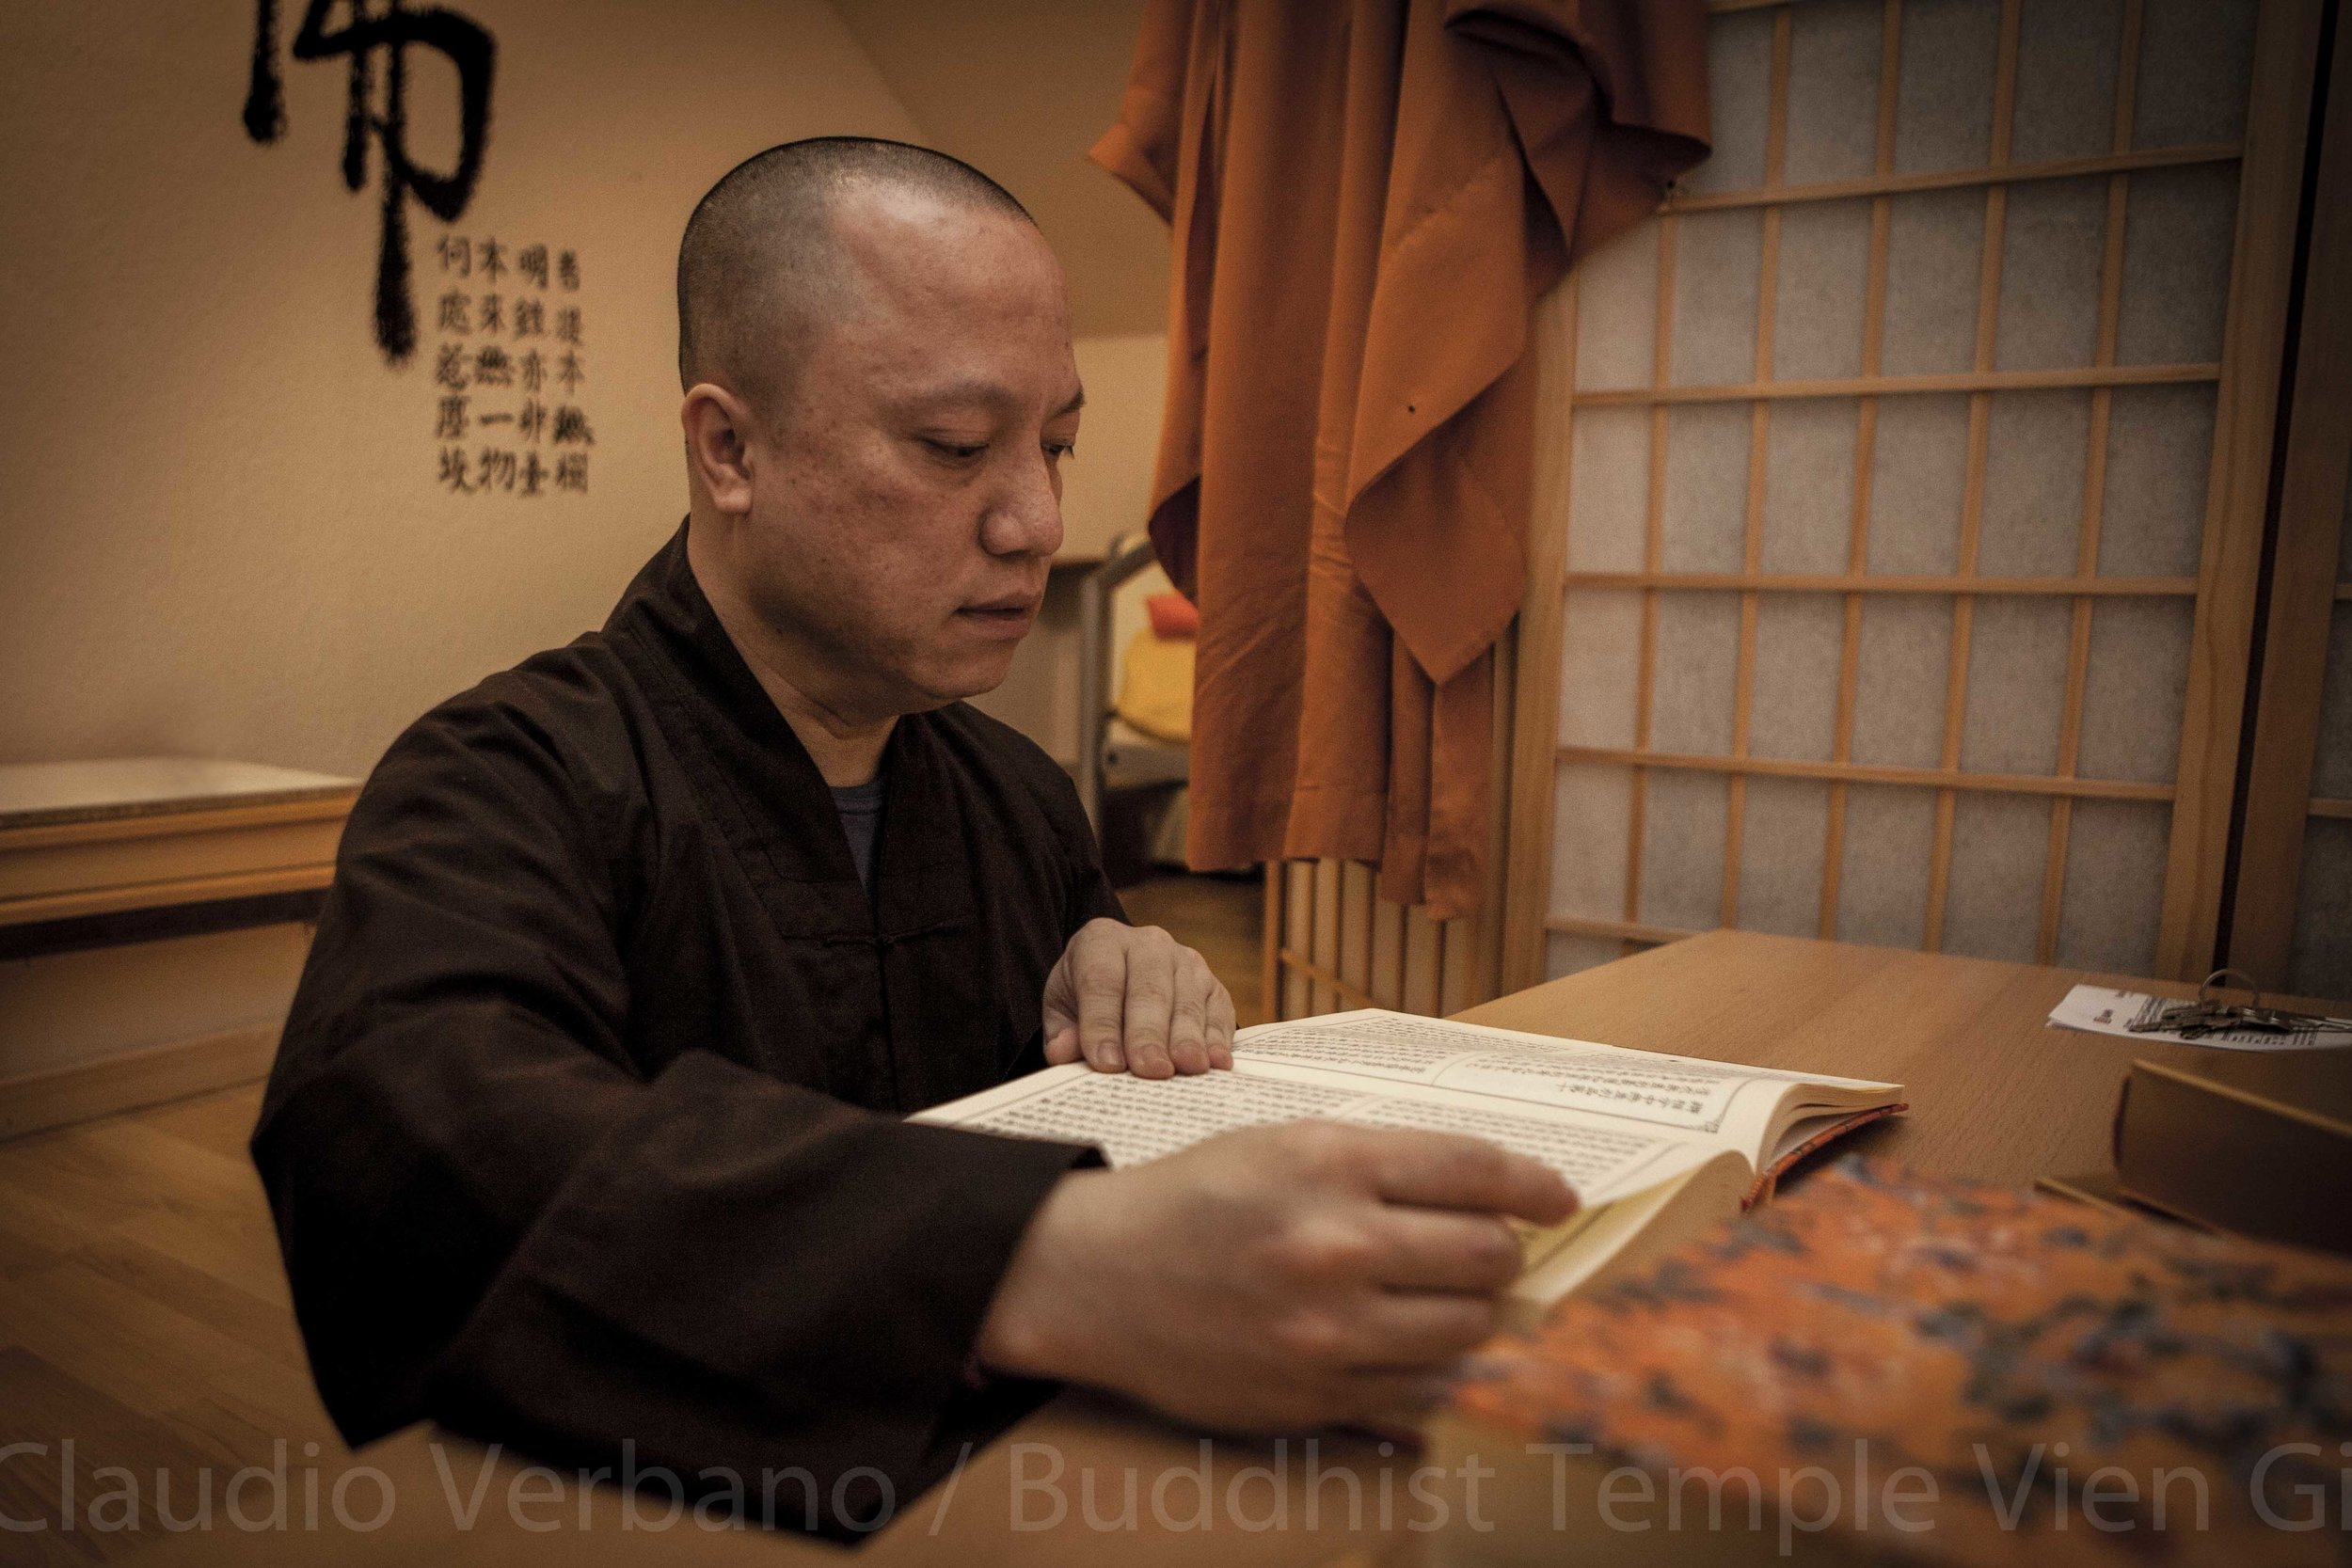 Buddhistischer Tempel Vien Giac Hannover Claudio Verbano_14.jpg